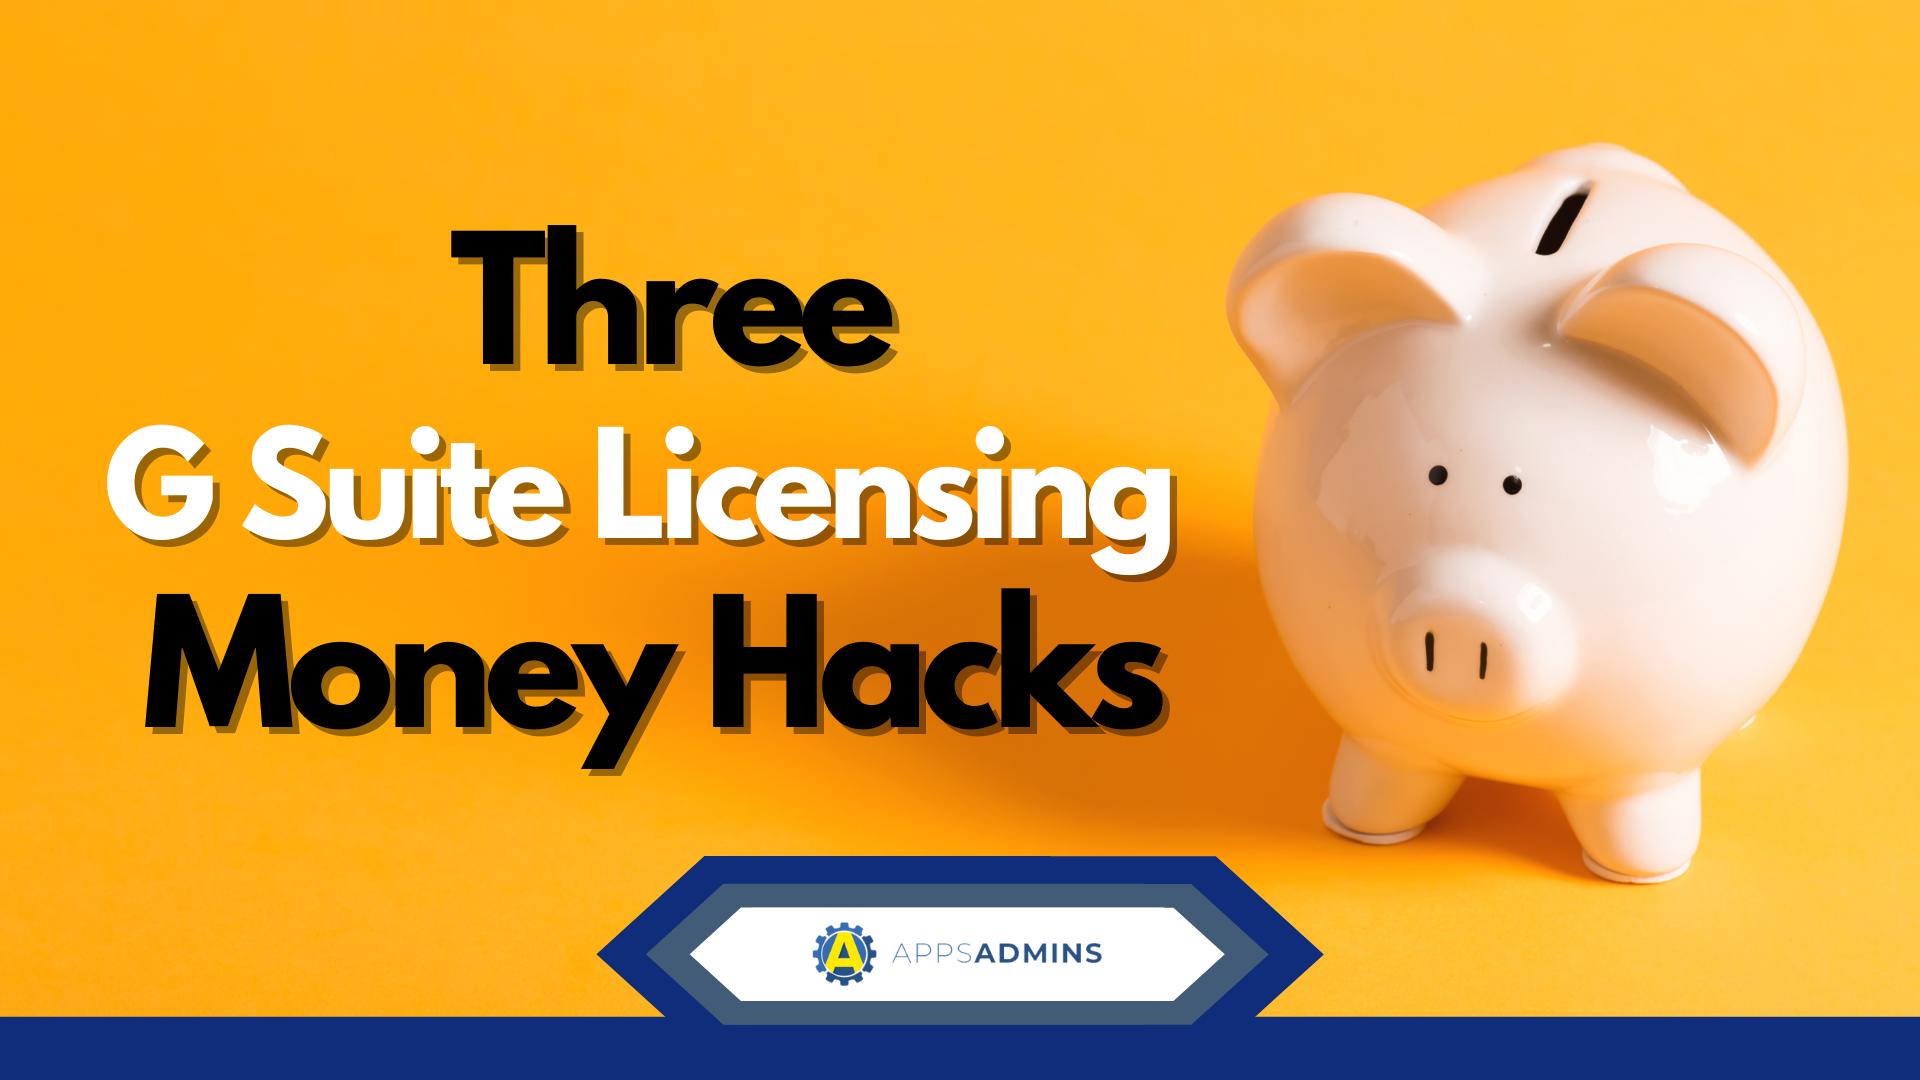 G Suite Licensing Money Hacks (1)